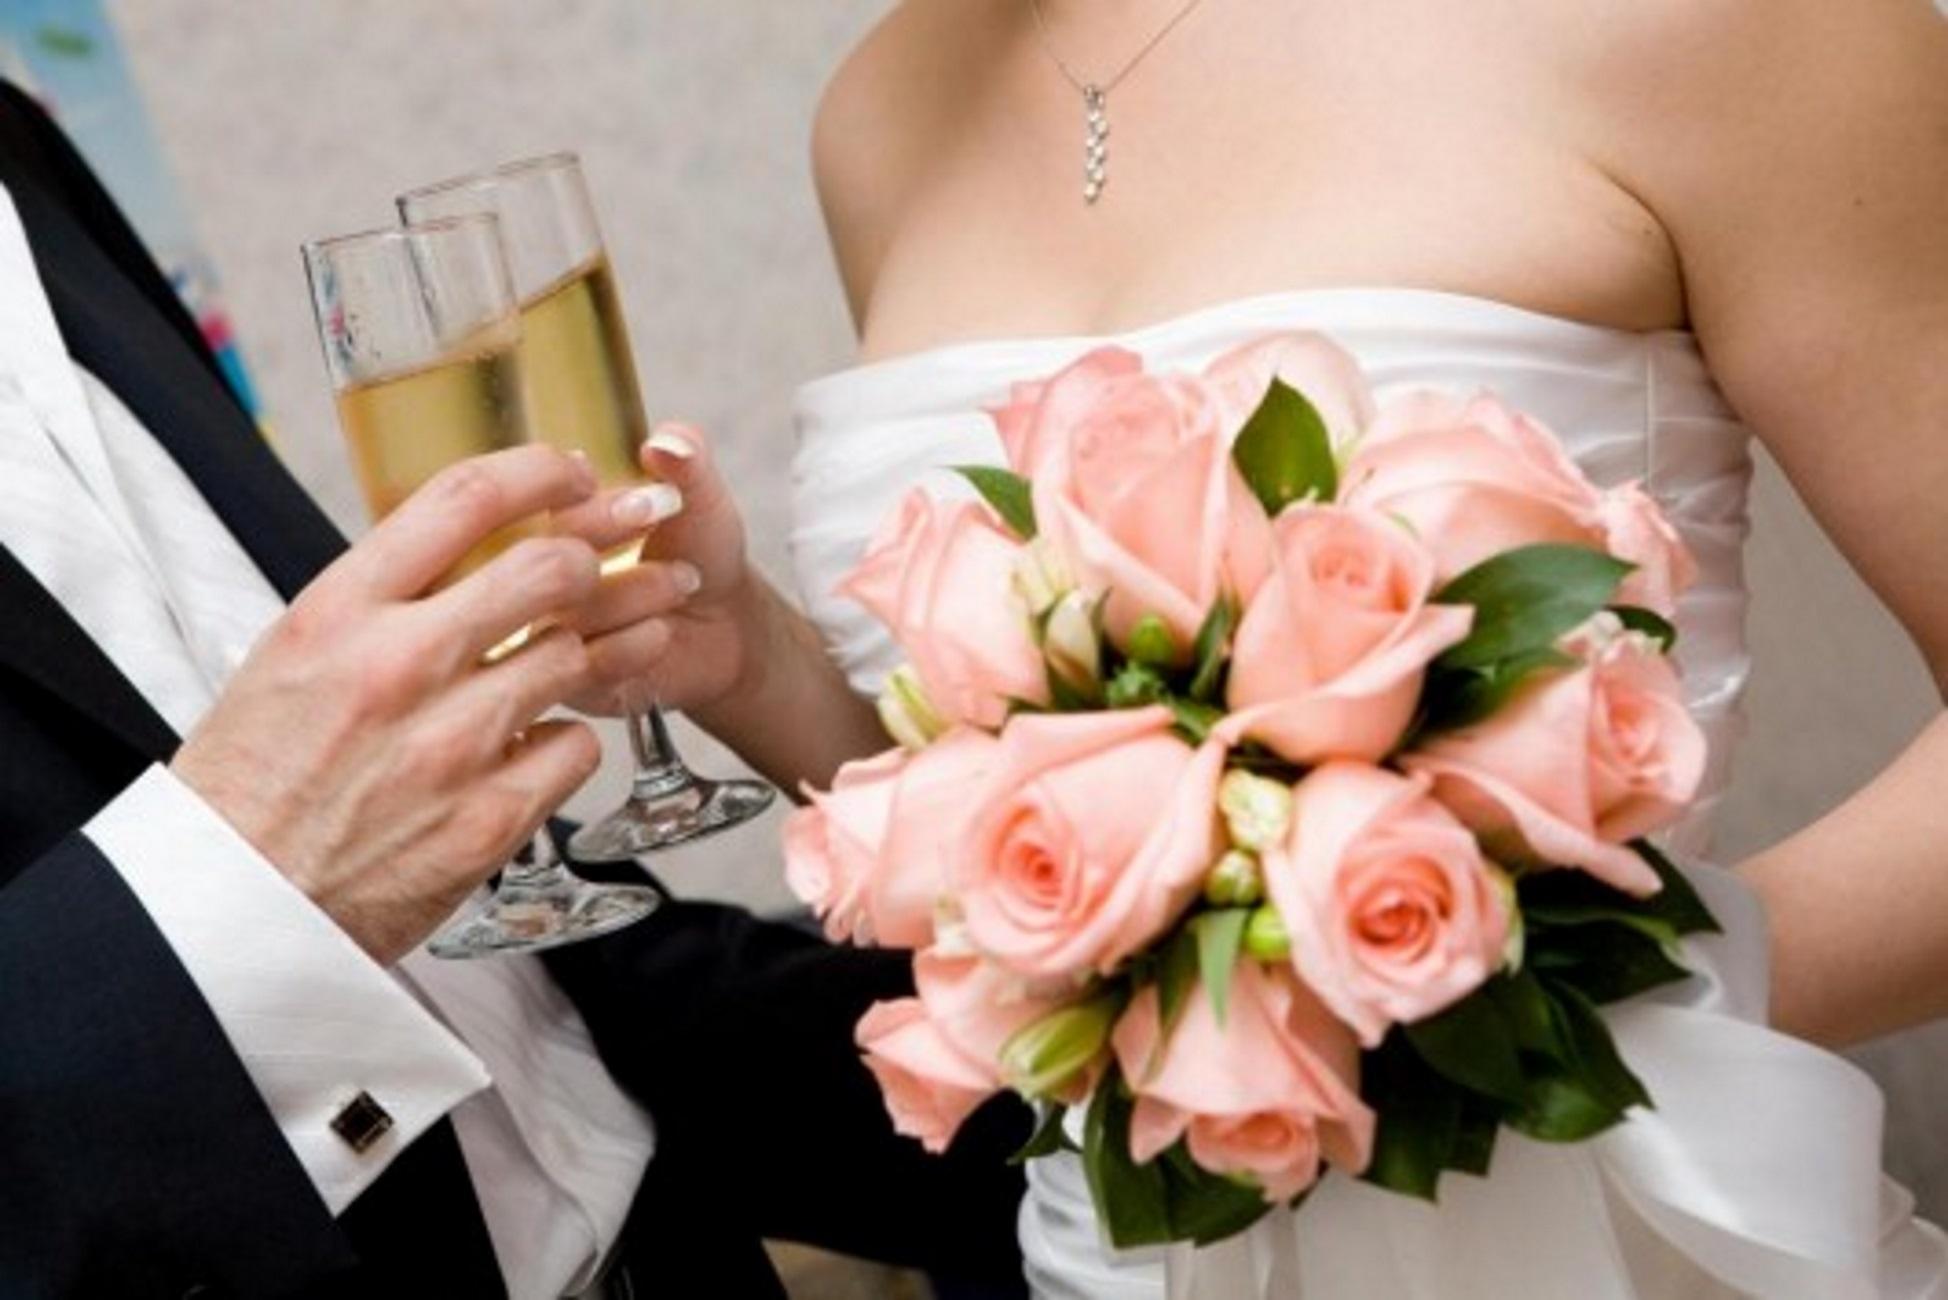 Lockdown: Πότε «ανοίγουν» δεξιώσεις γάμων & μουσική στην εστίαση